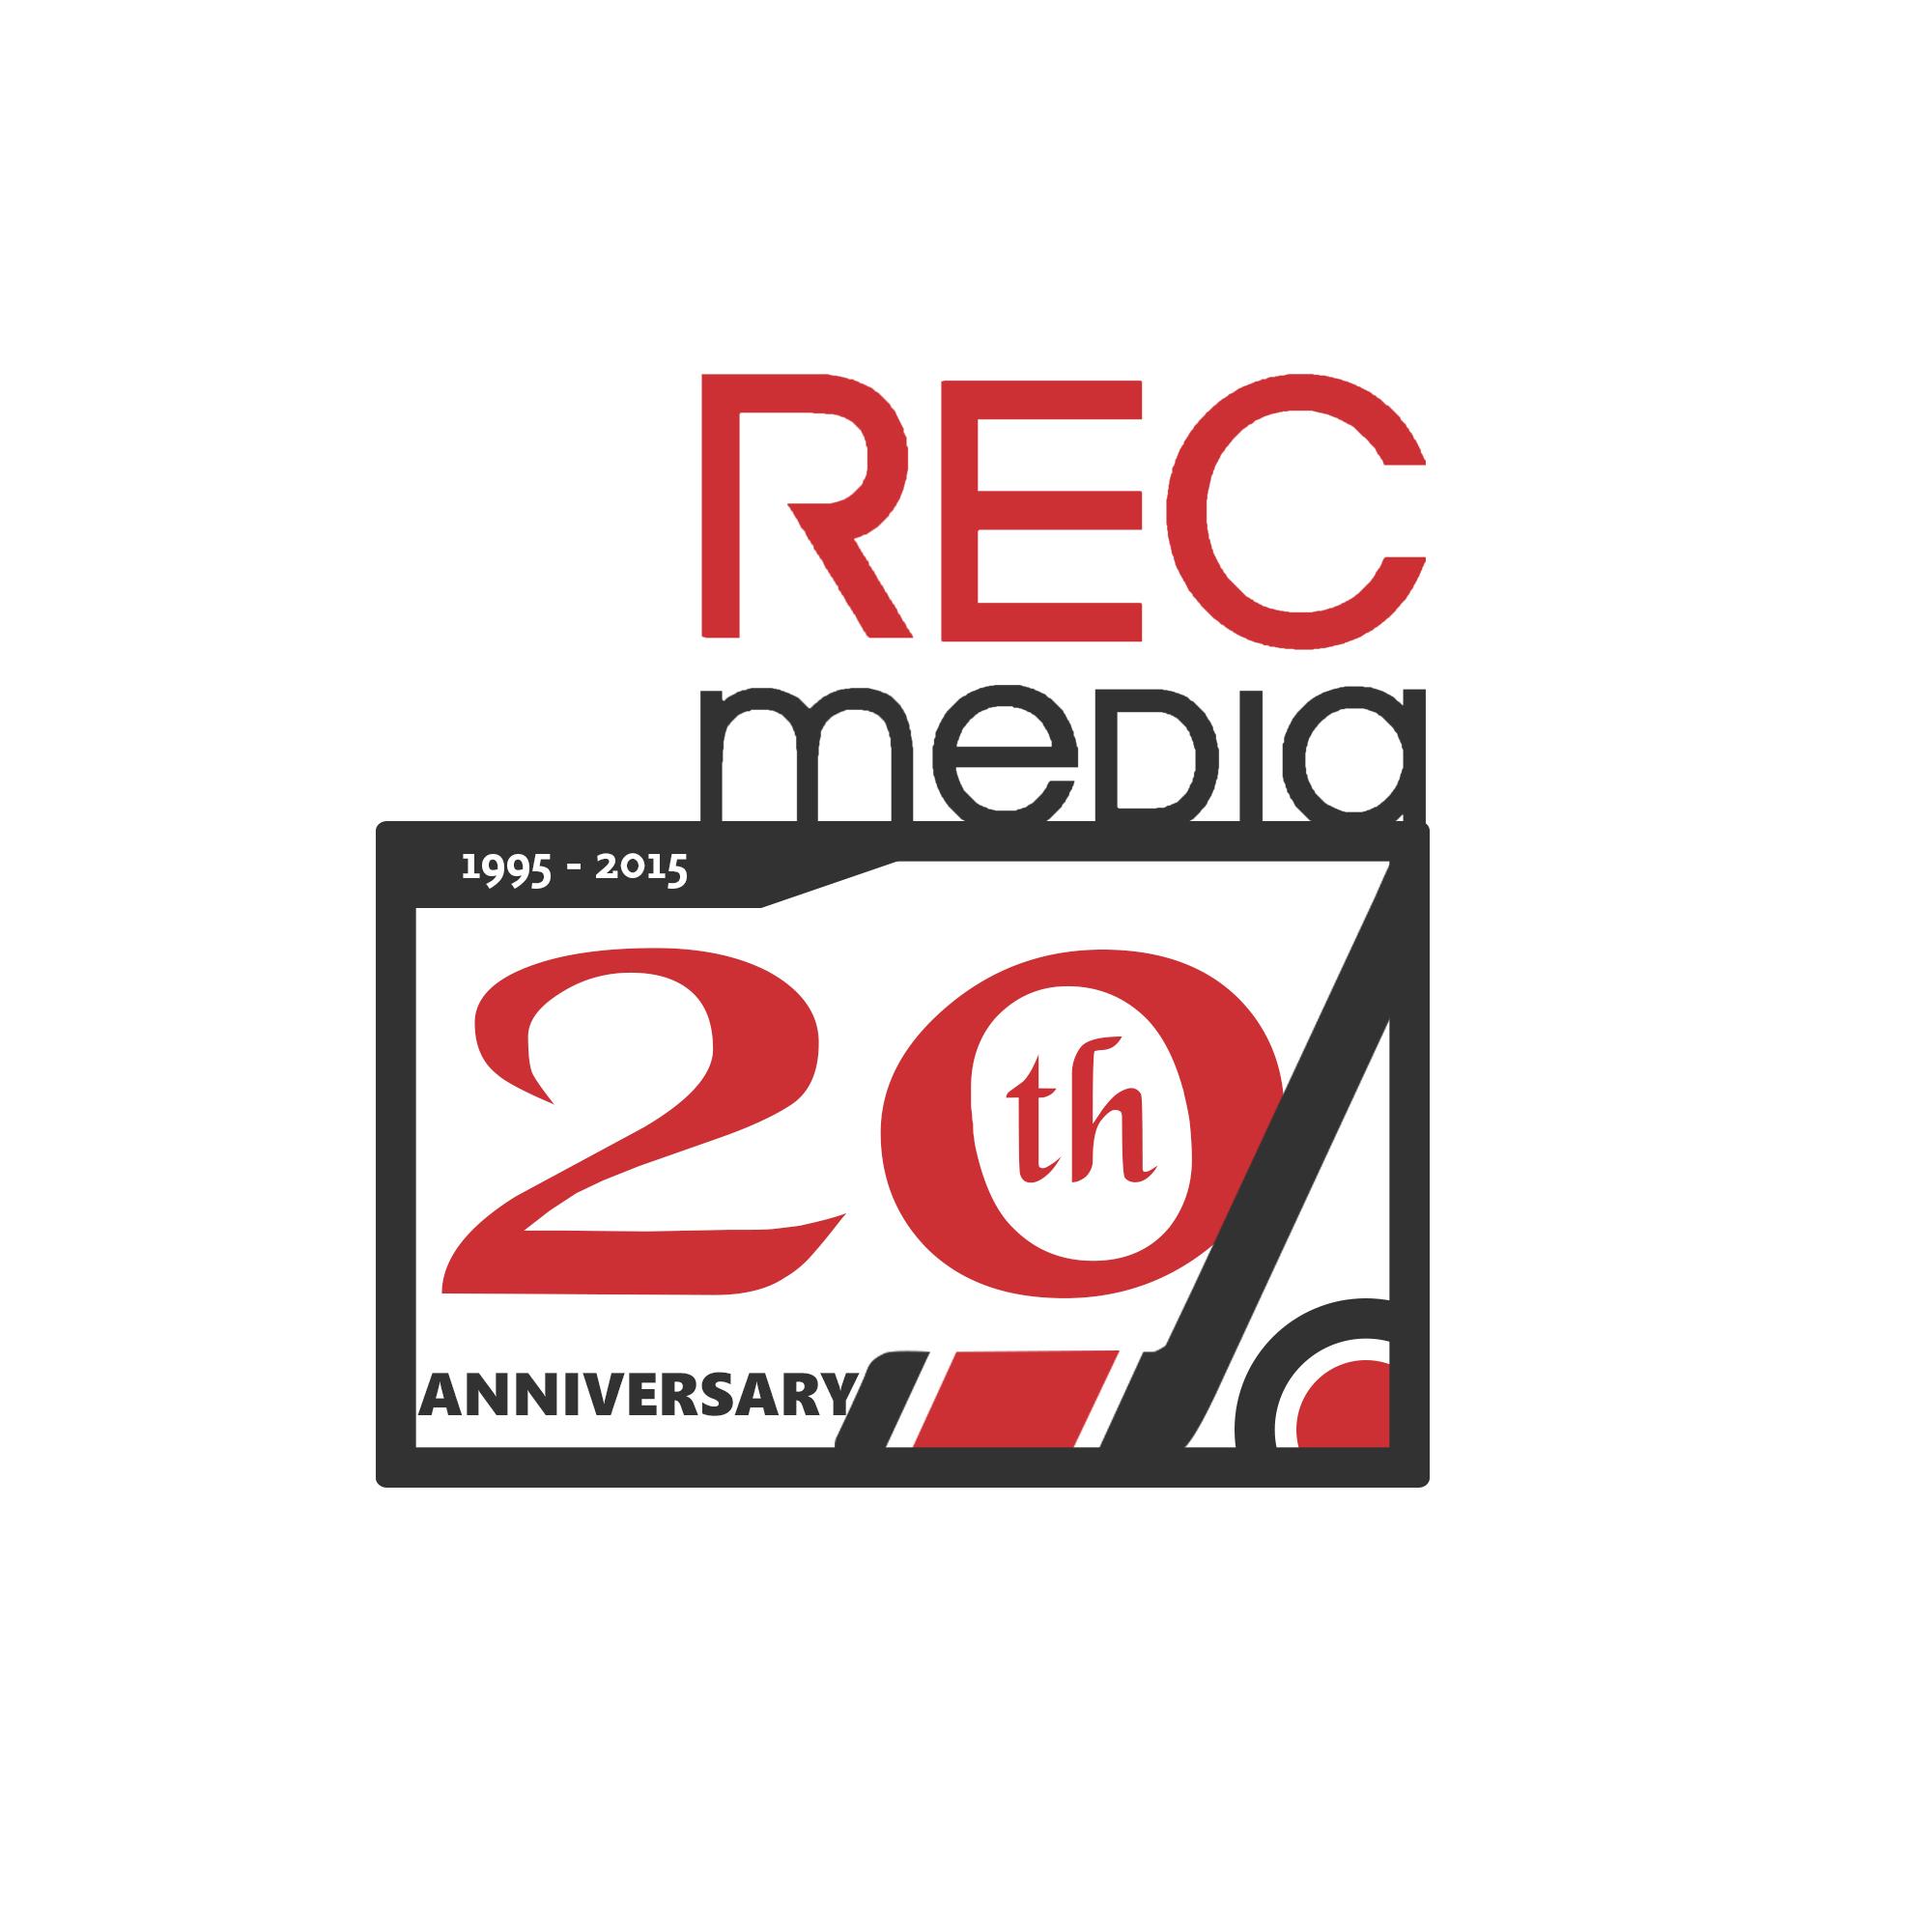 Logo Design by Jessy Pimentera - Entry No. 24 in the Logo Design Contest REC Media Logo Design.